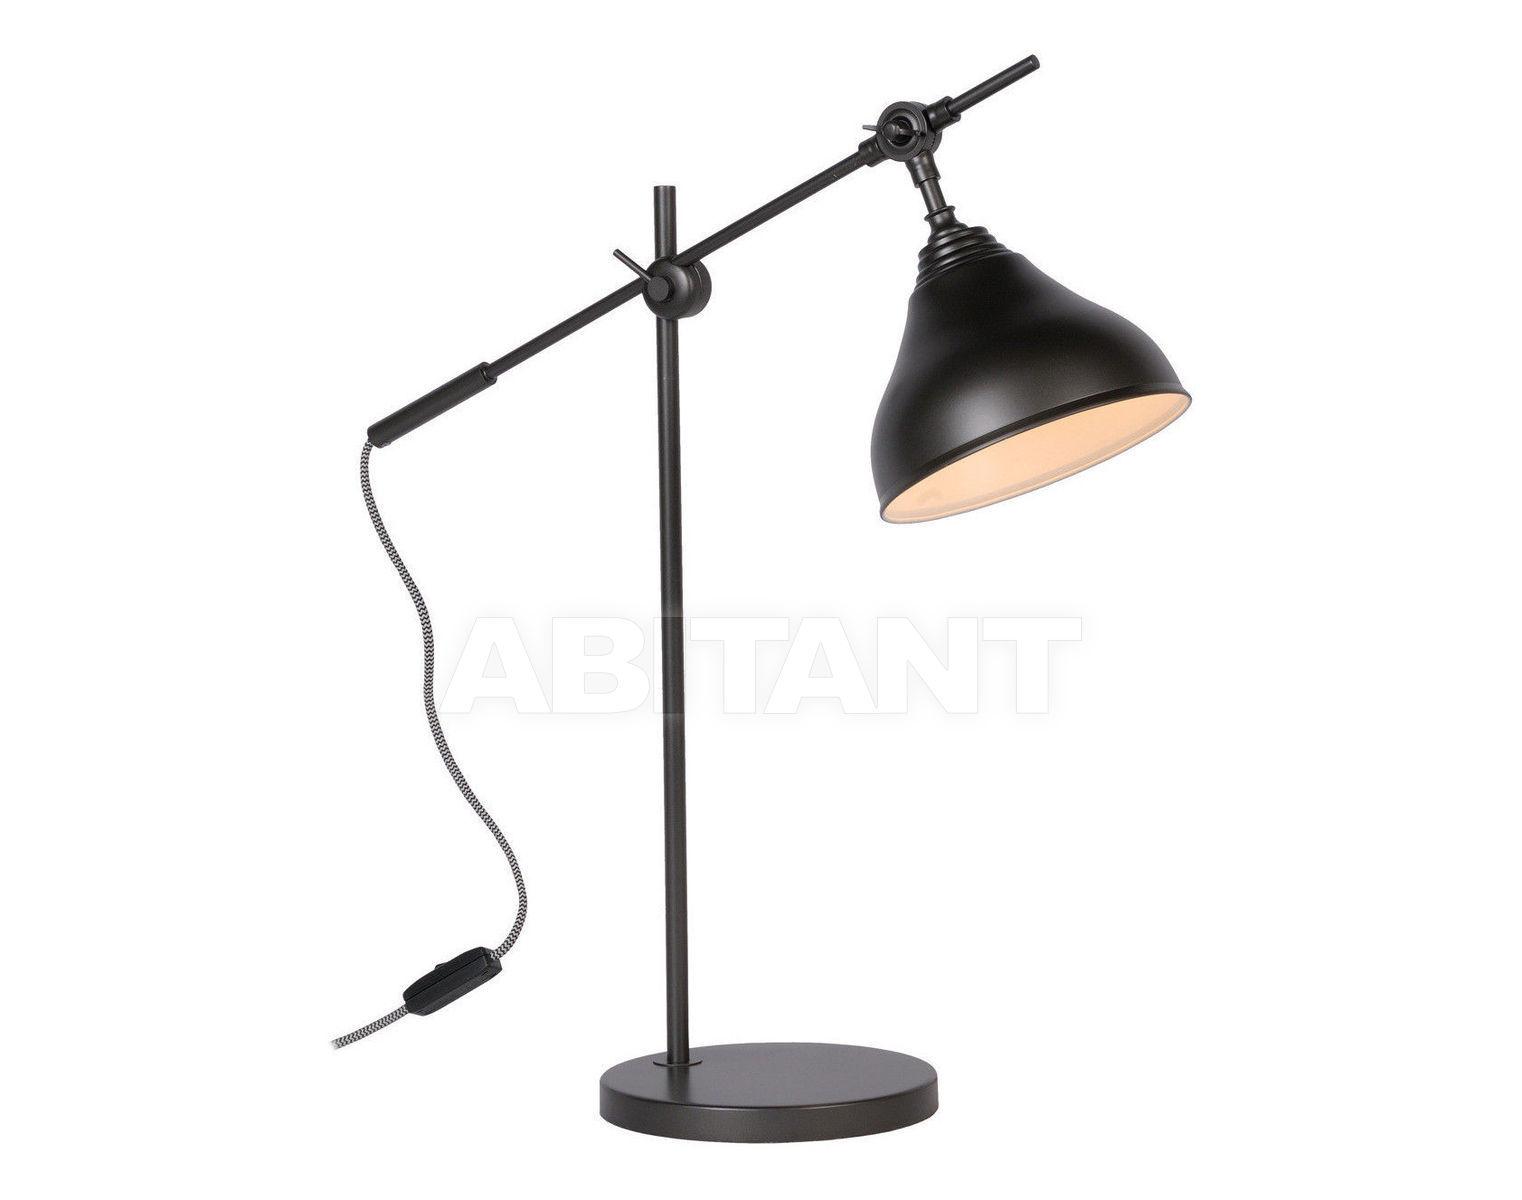 Купить Лампа настольная DORDRECHT Lucide  Table And Floorlamps 31653/01/15